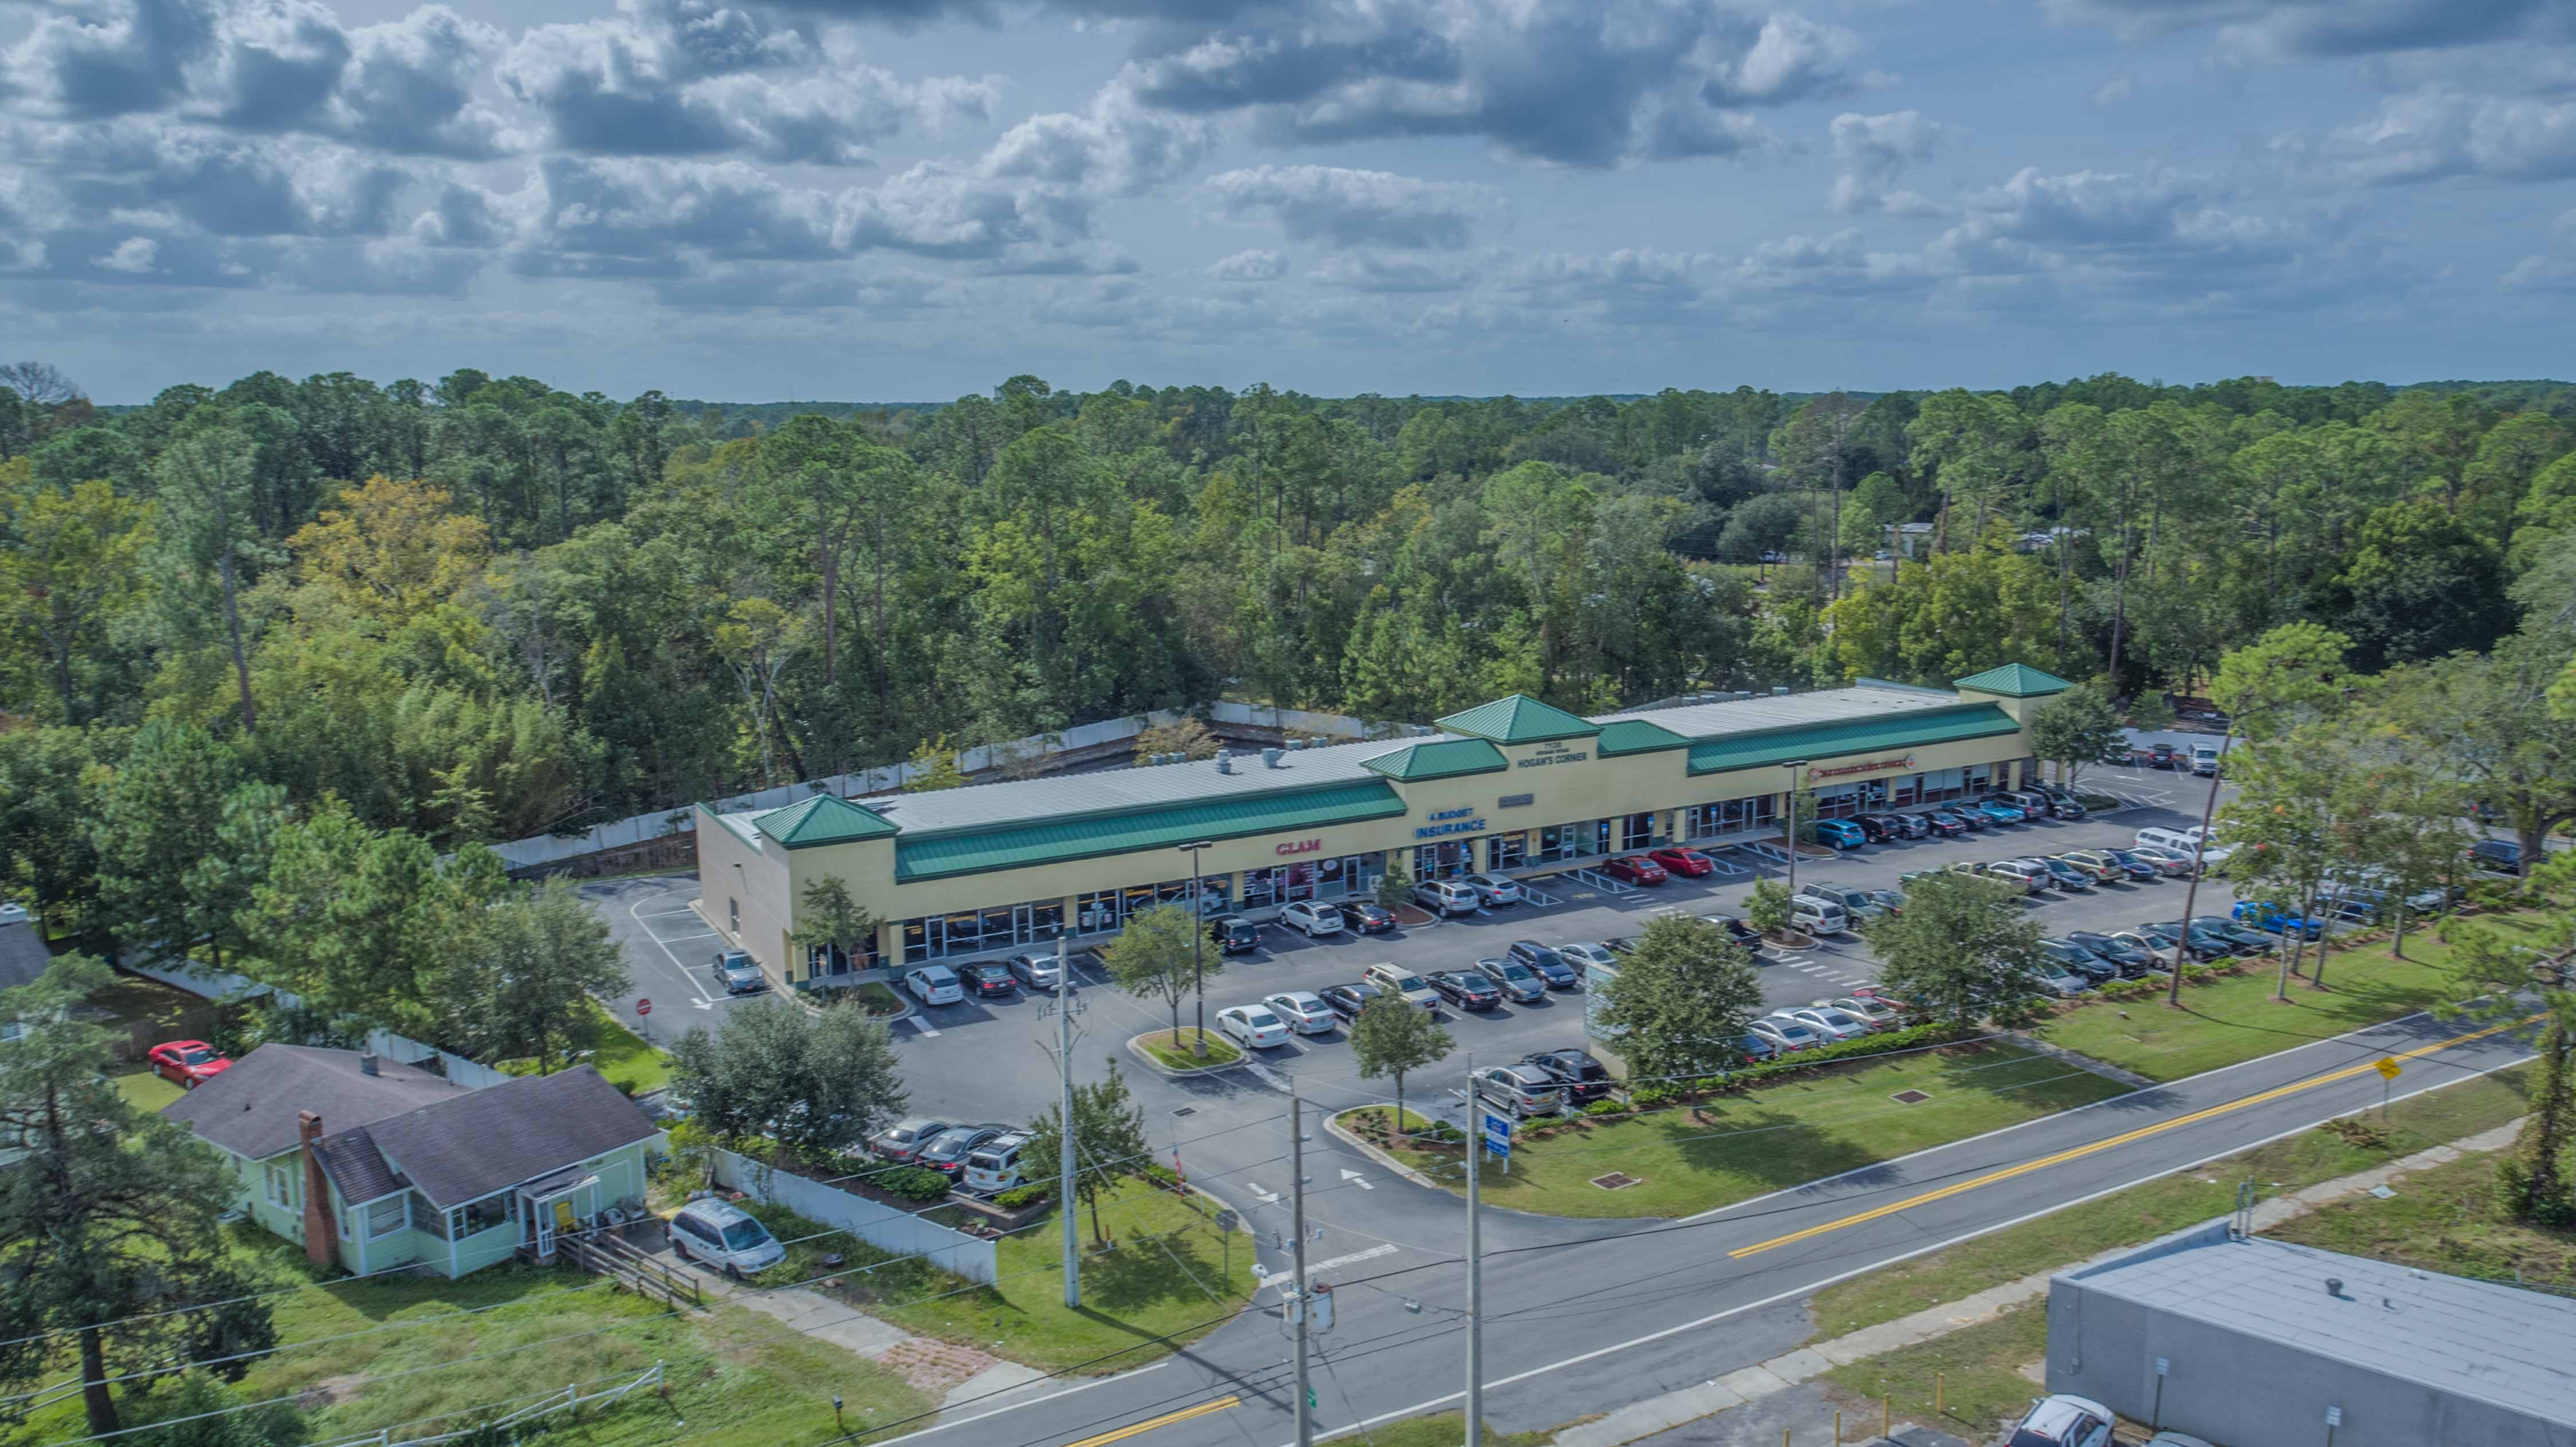 Hogan's Corner, 7120 Hogan Rd, Jax, FL 32216, 1,000 to 5,000 sf, office/retail